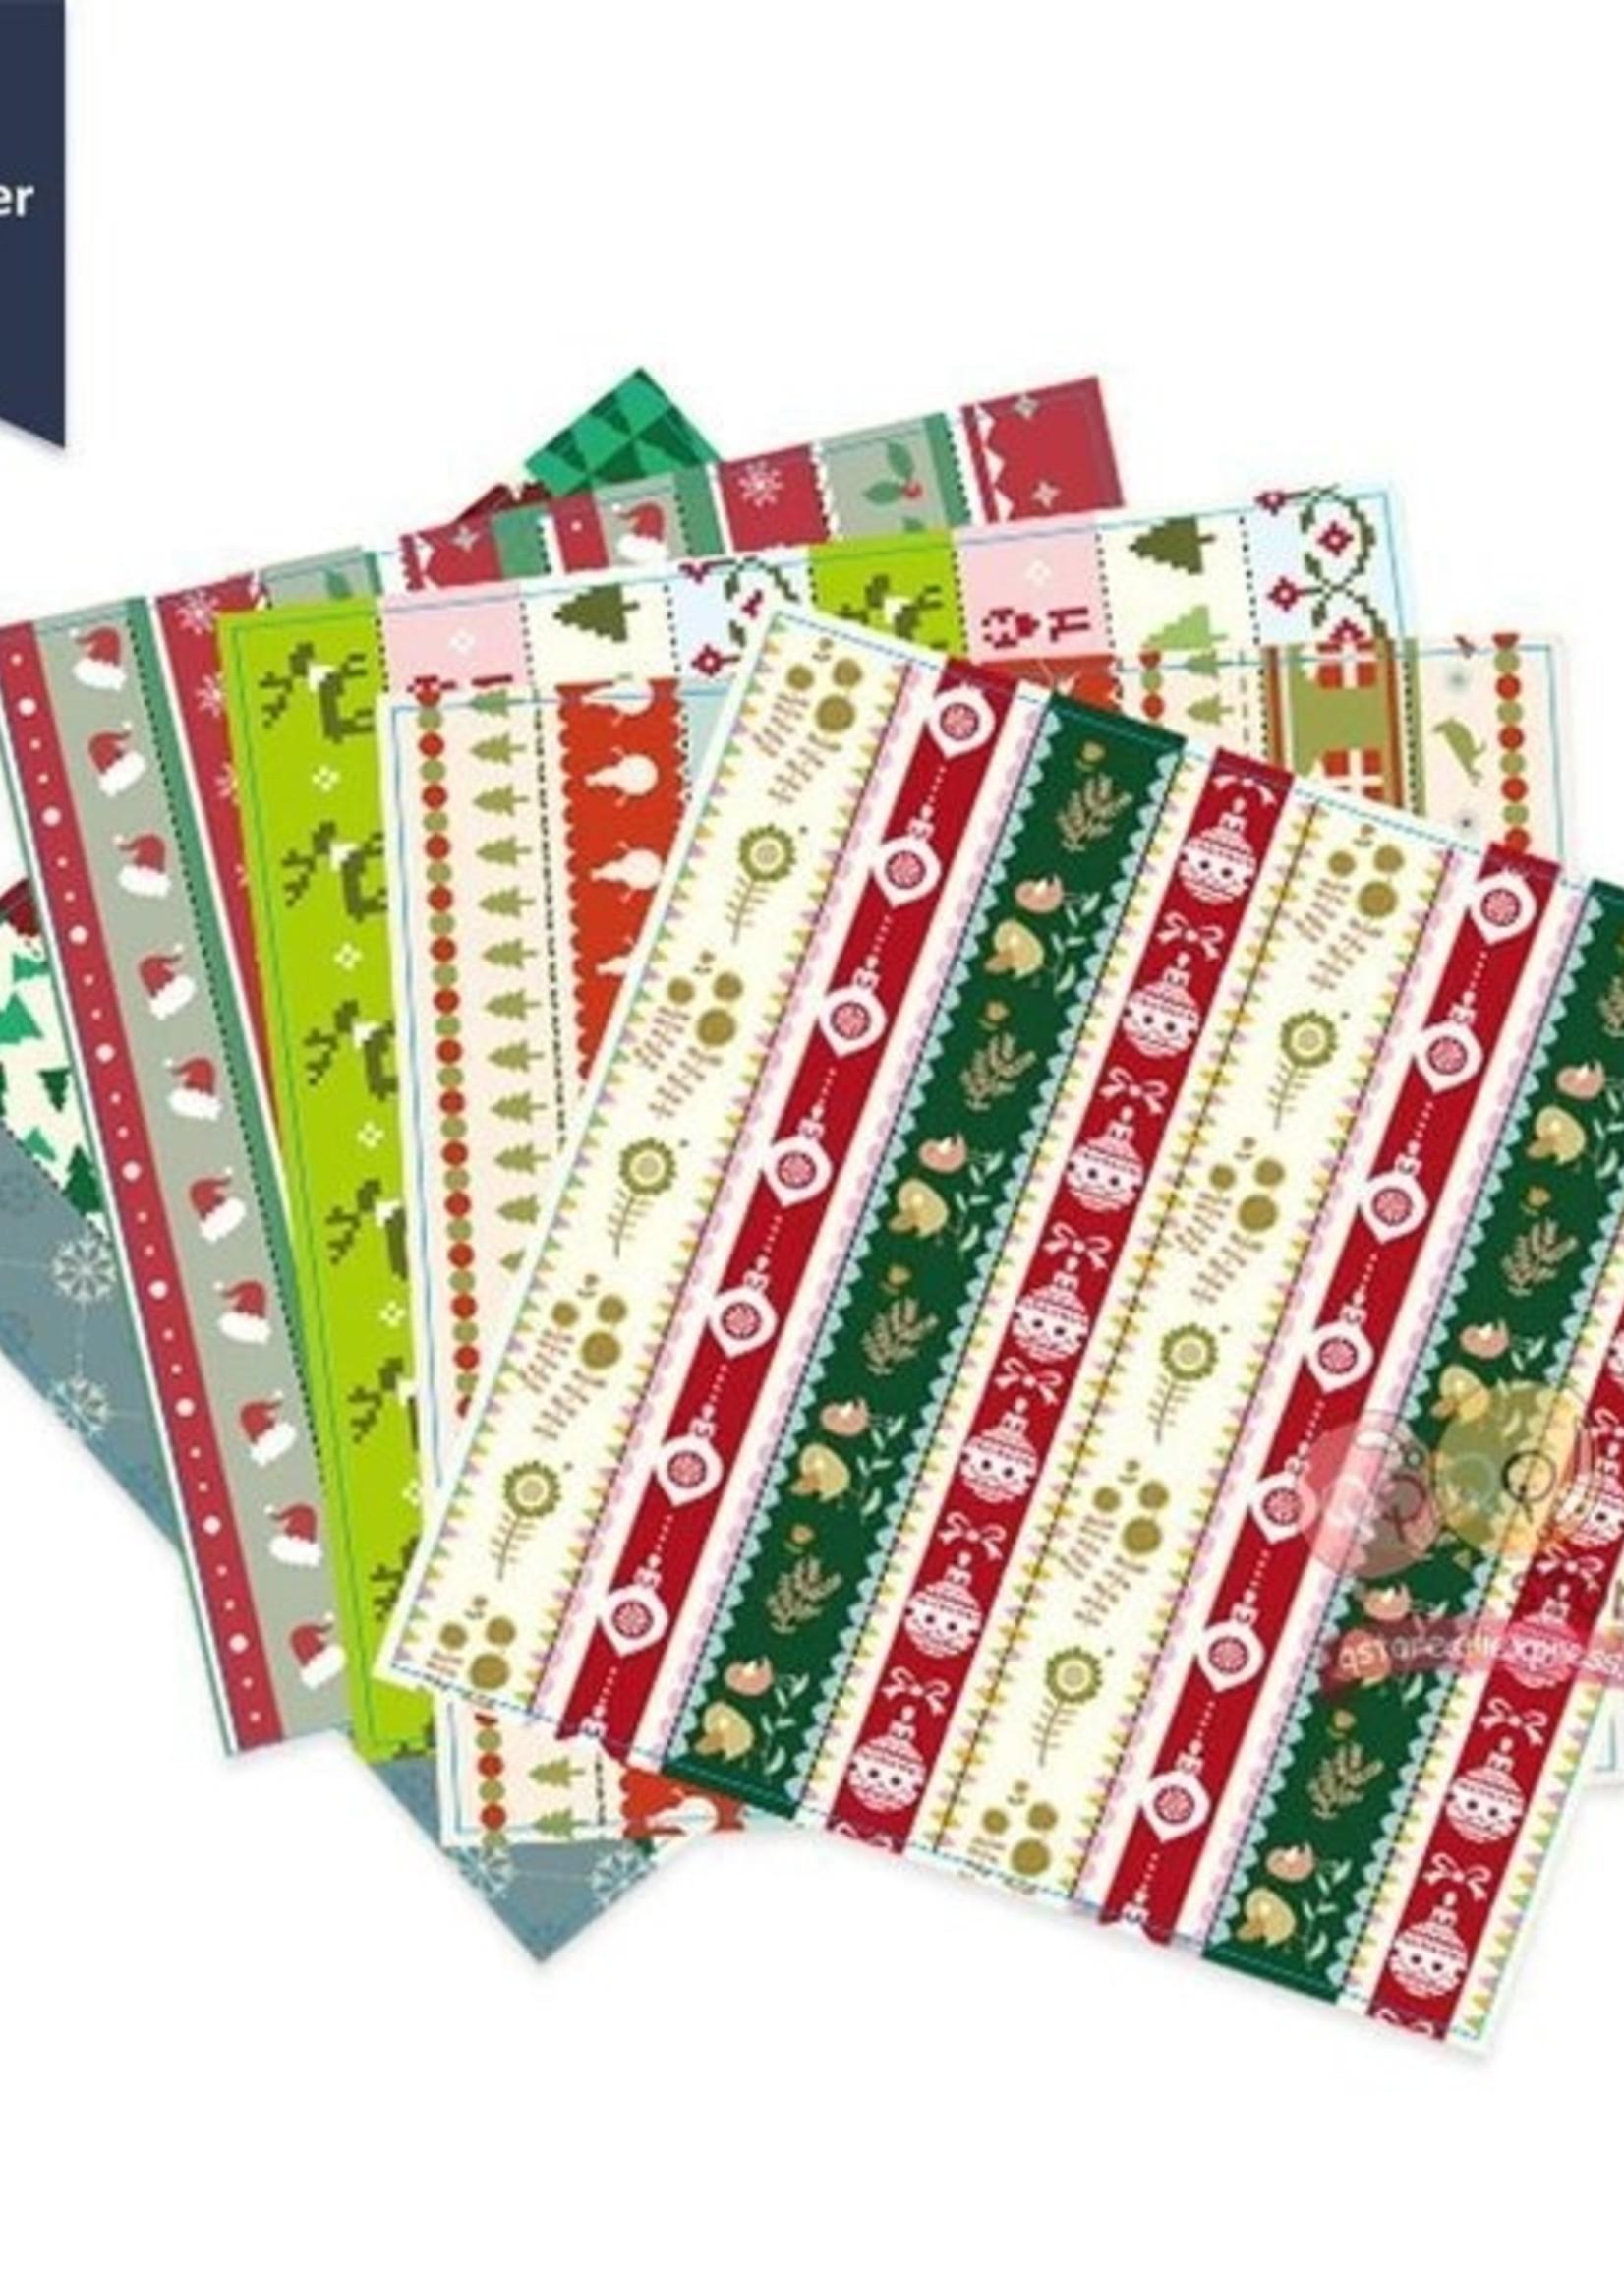 Mideer Mideer-AW20 MD4010 Origami - Christmas 60 pcs